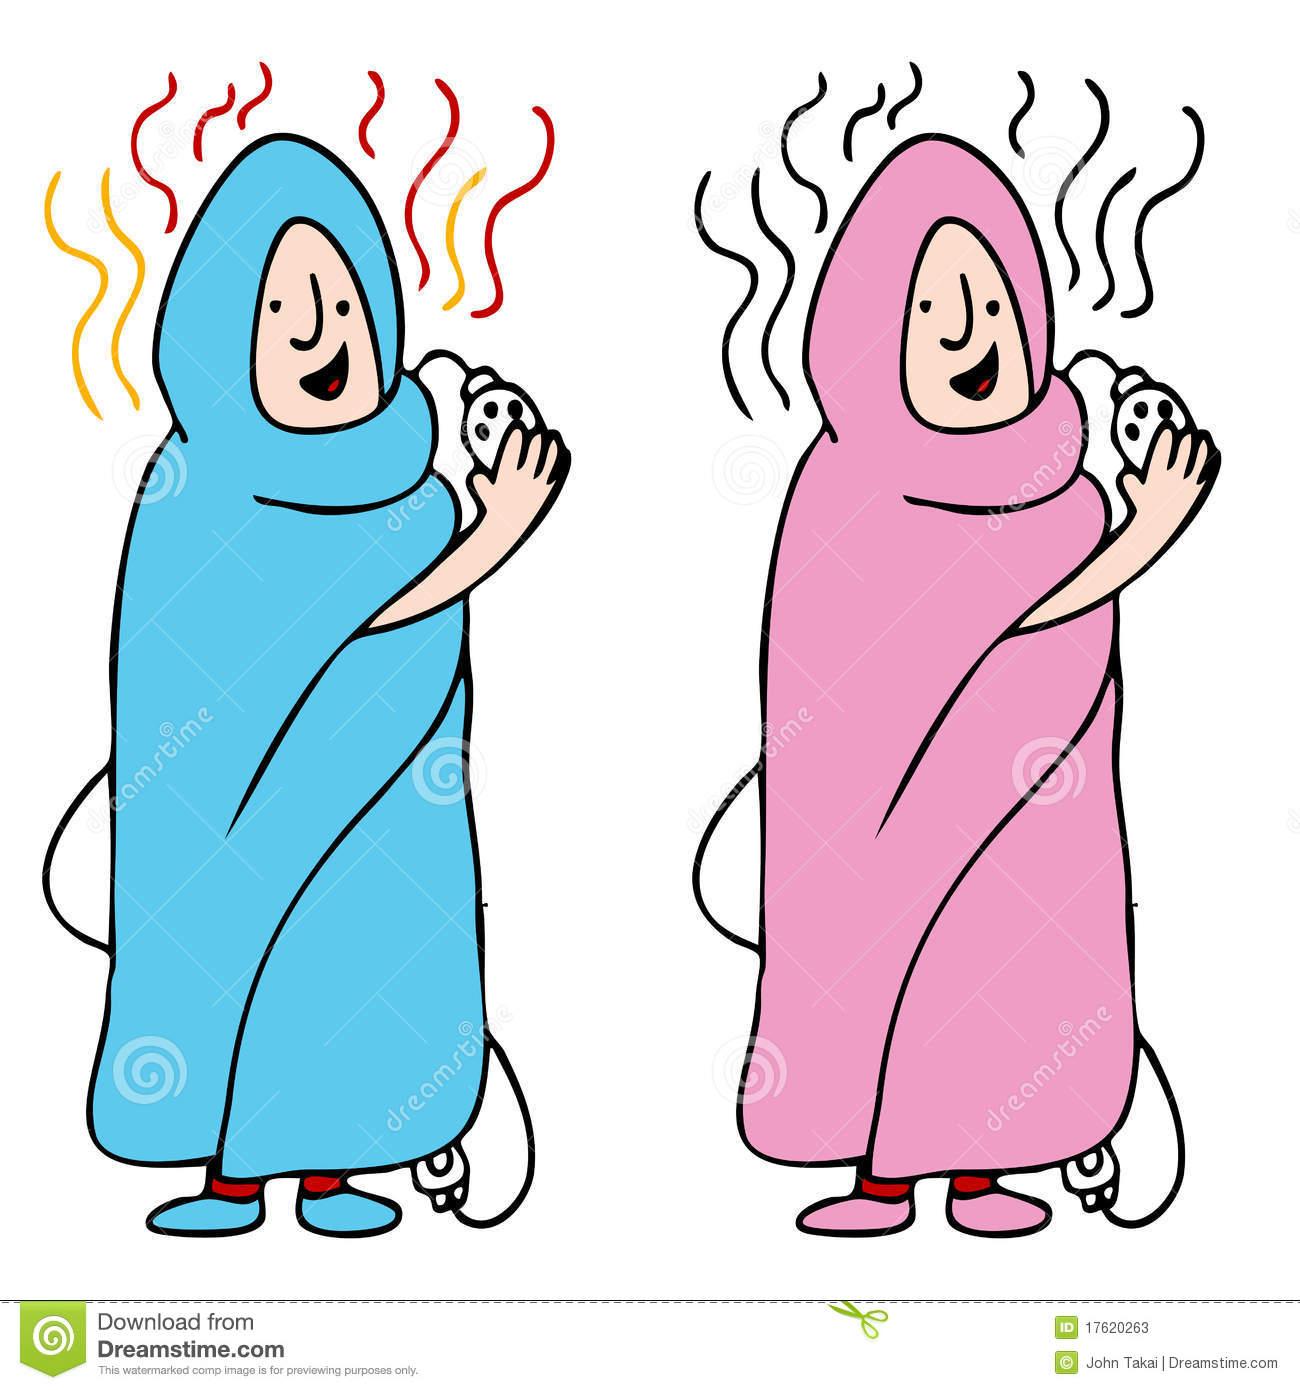 Blanket clipart warm blanket Blankets Warm Art cliparts Clipart